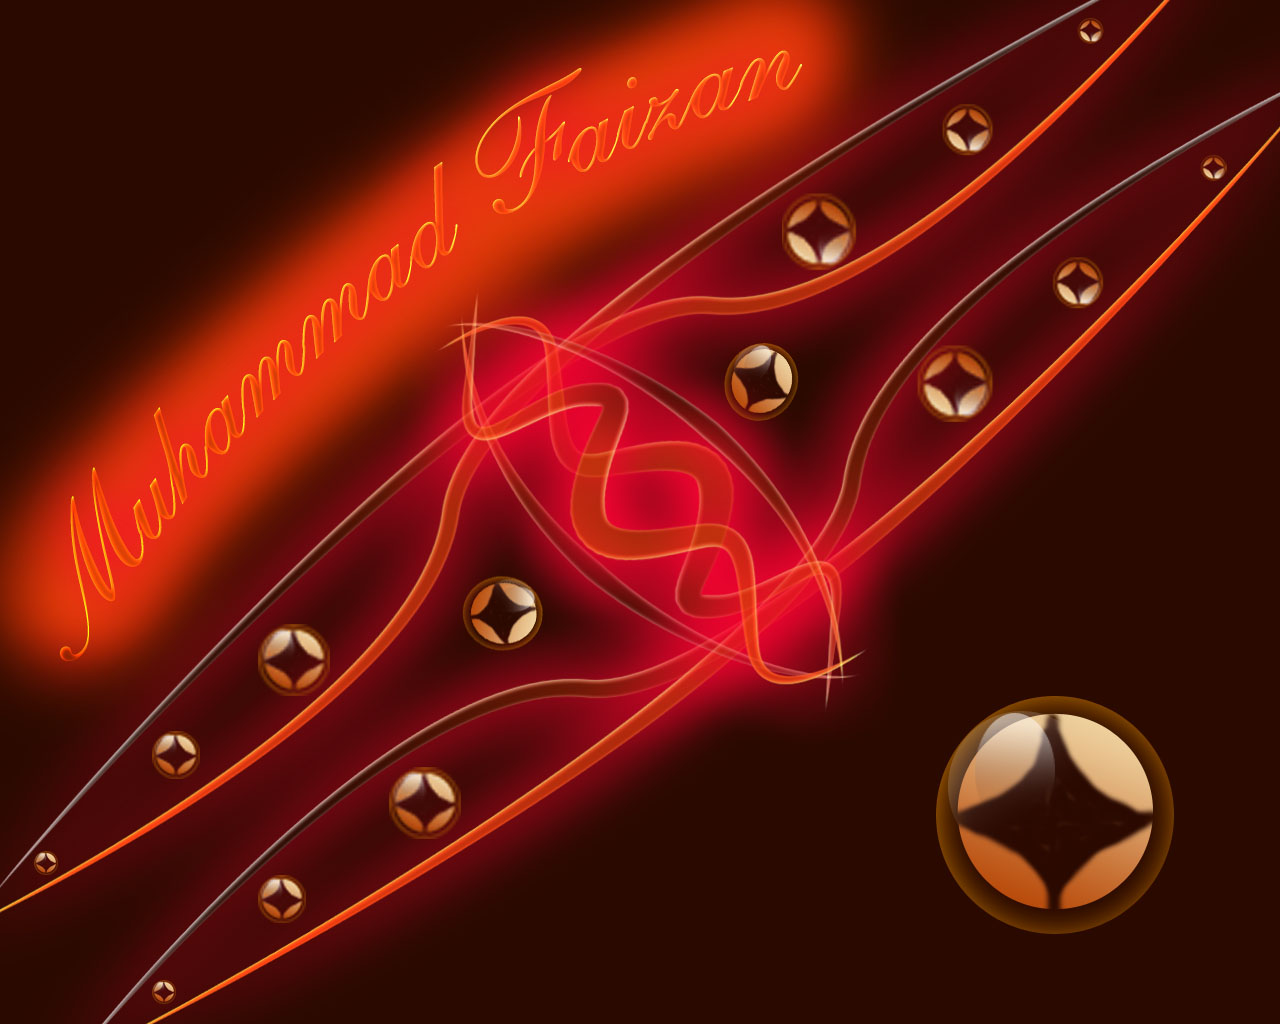 http://2.bp.blogspot.com/_6OnZuRfdb5c/TSW8moFQWtI/AAAAAAAAABo/B1ZvH7xWwqI/s1600/abstract+red+wallpaper.jpg